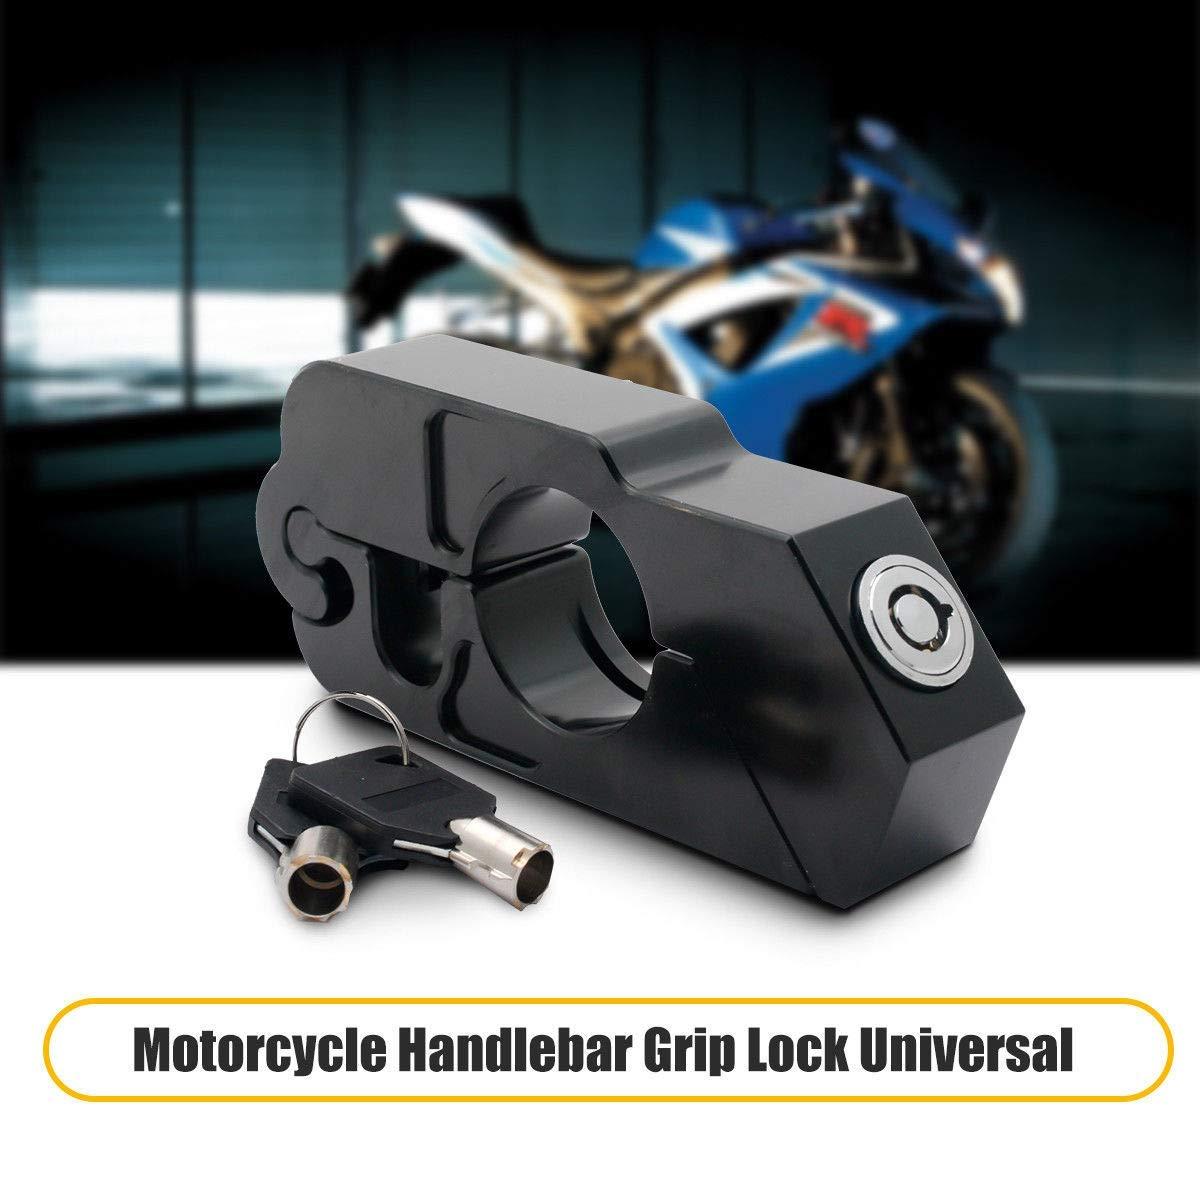 Motorbike Handlebar Lock HugeAuto Motorbike Motorcycle Handlebar Throttle Grip Lock Aluminum Alloy Anti-theft Brake Level Lock for Bike Scooter Moped ATV Black